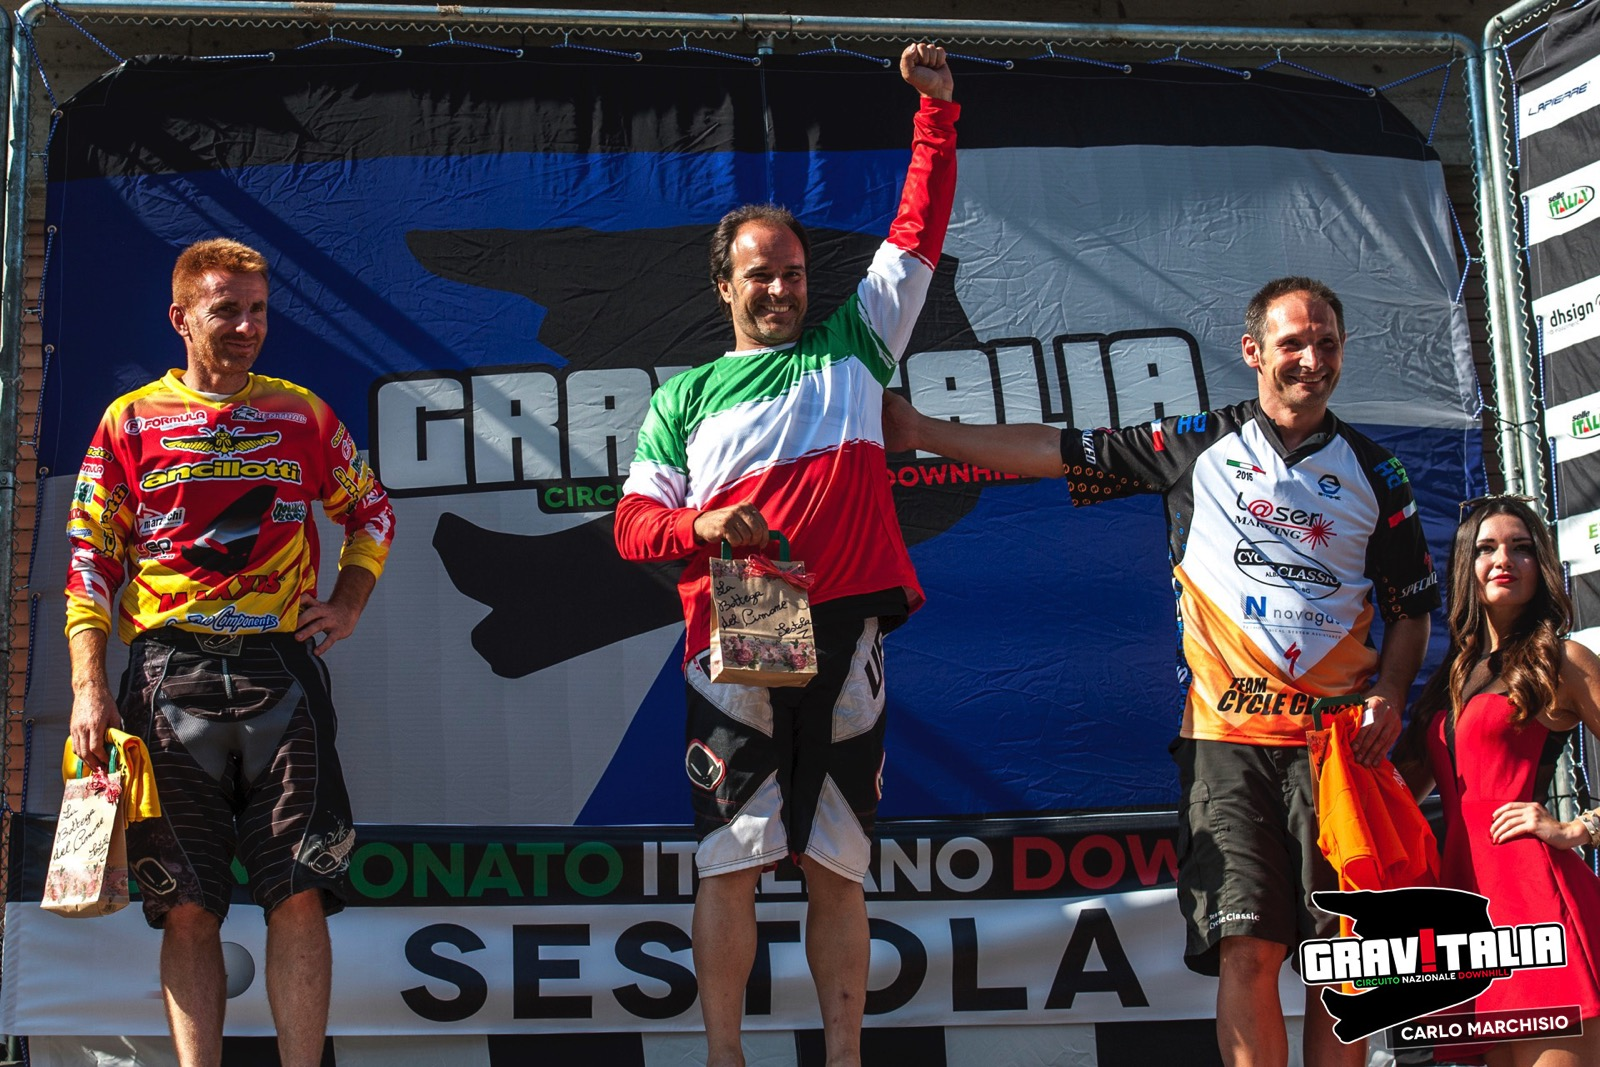 PhotoCarloMarchisio_GIT2015_CampionatiItaliani_Sestola_042